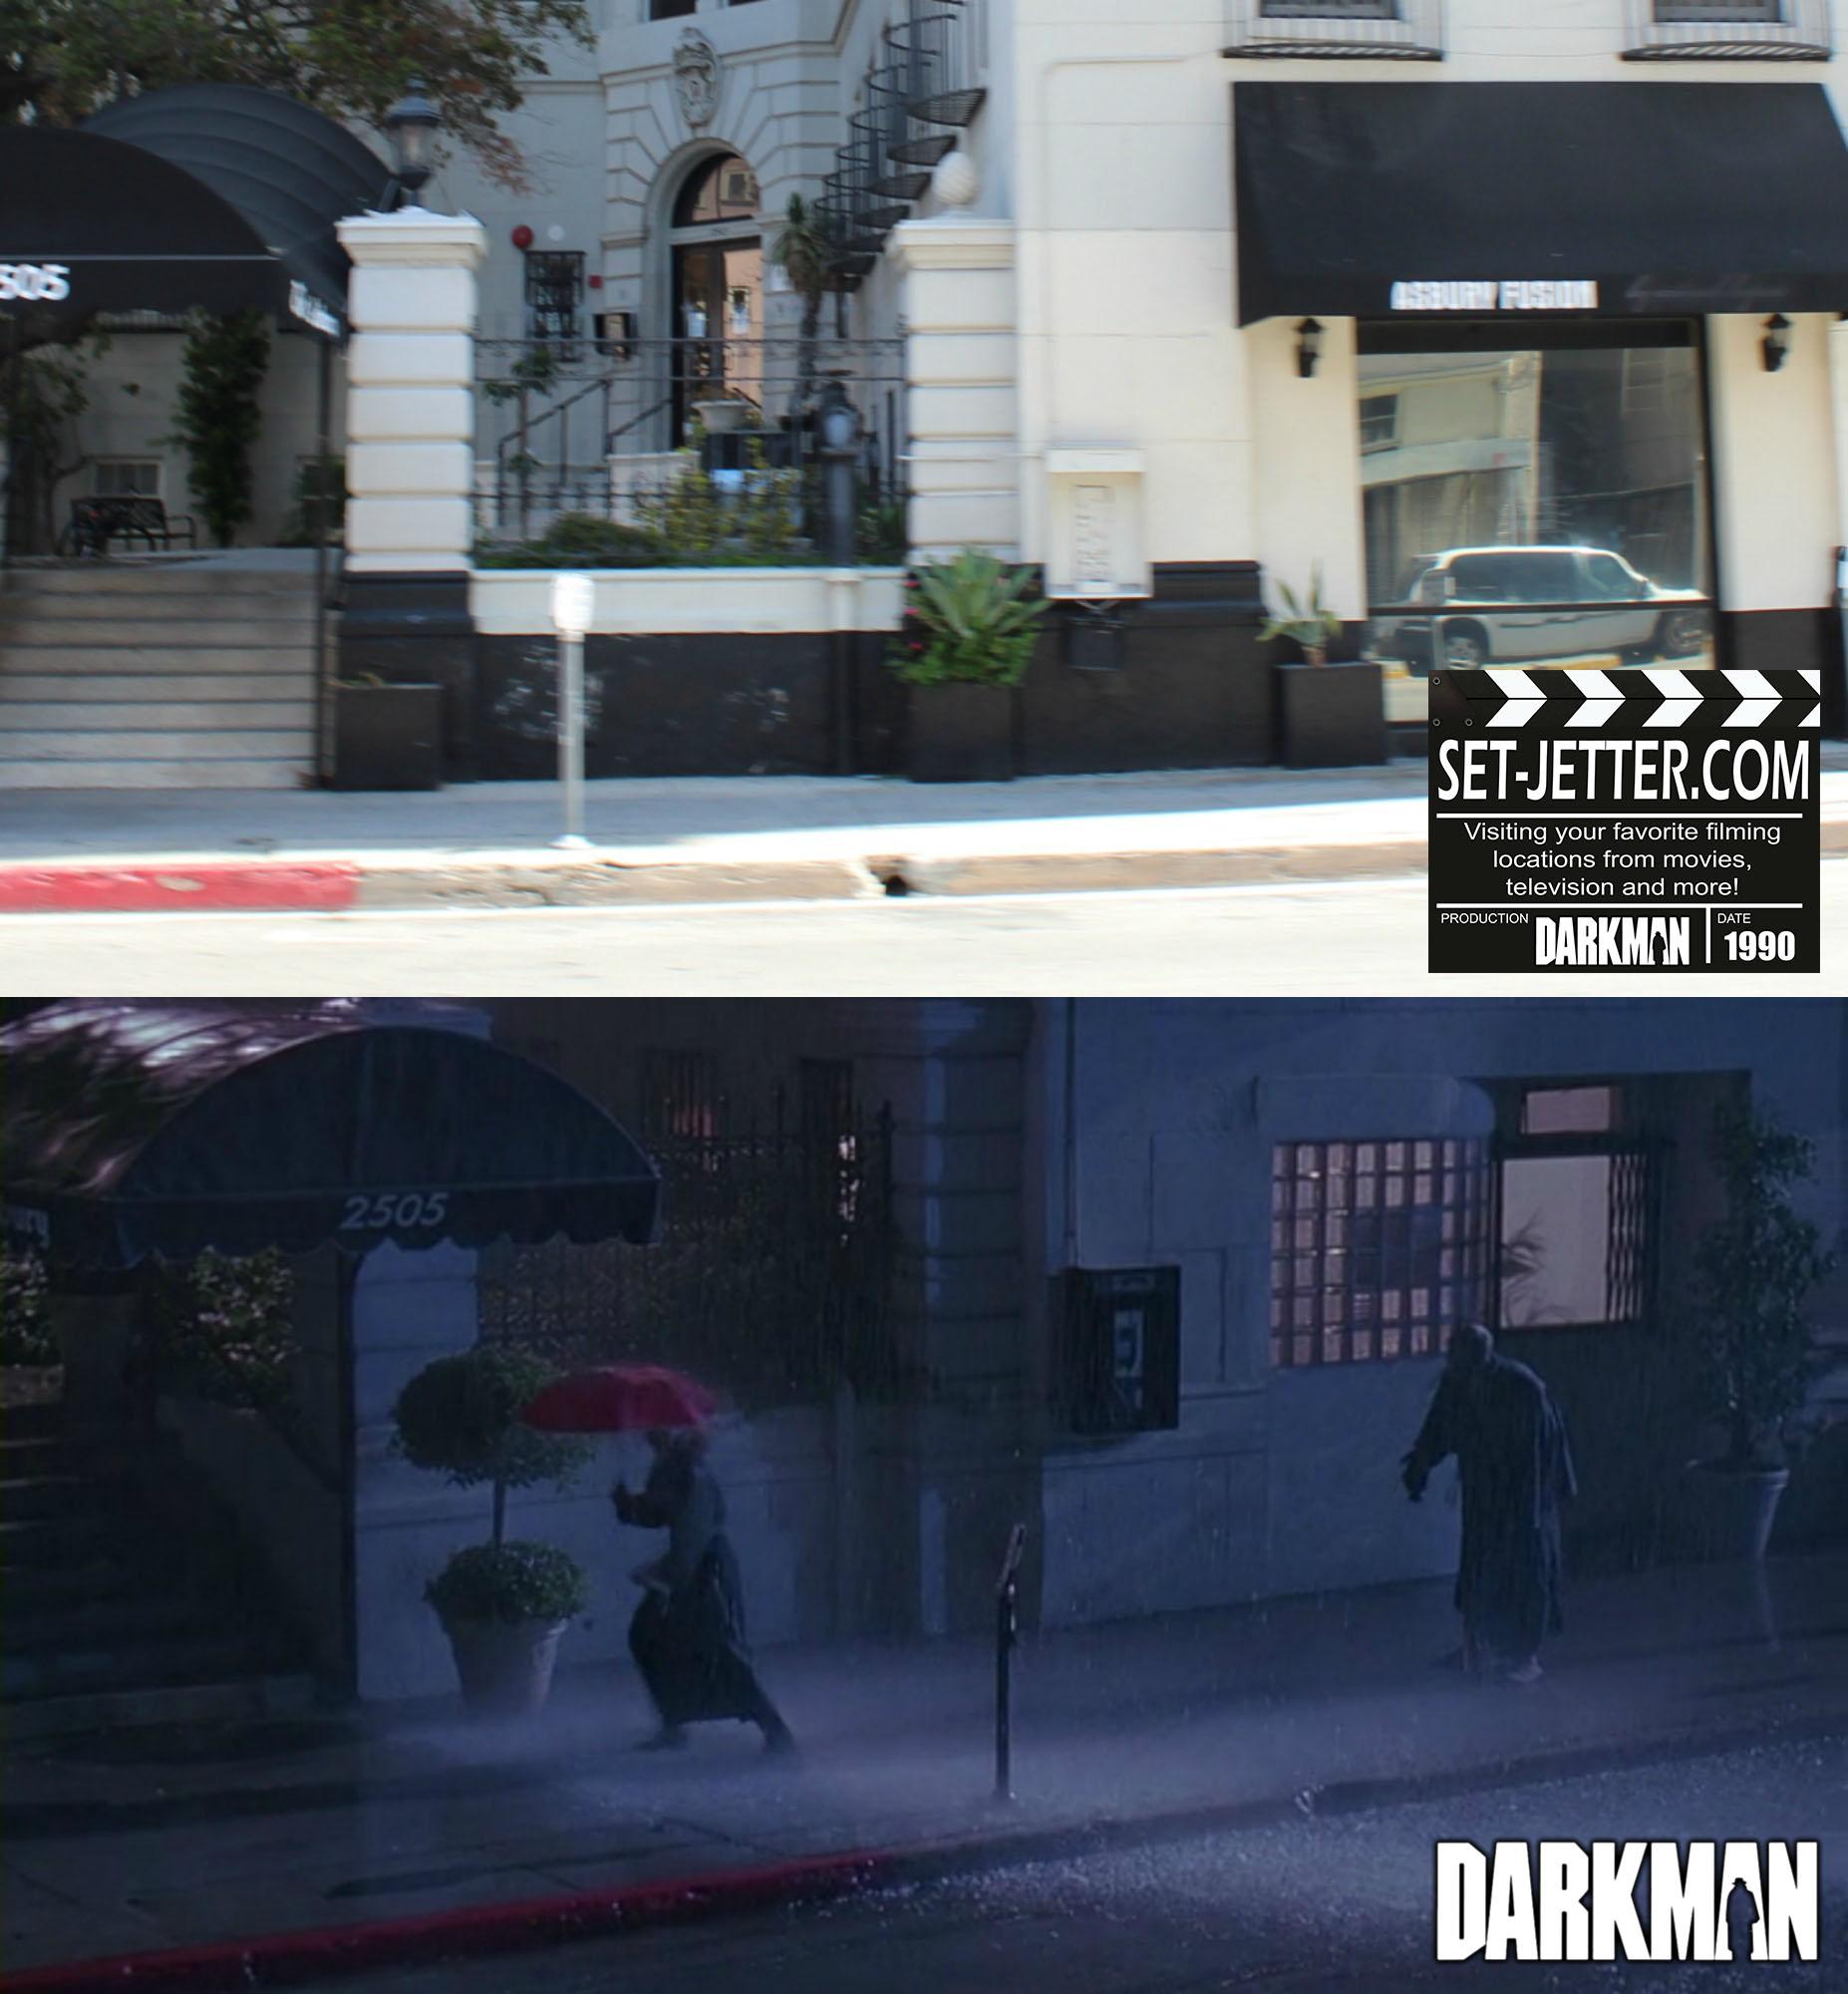 Darkman 07.jpg